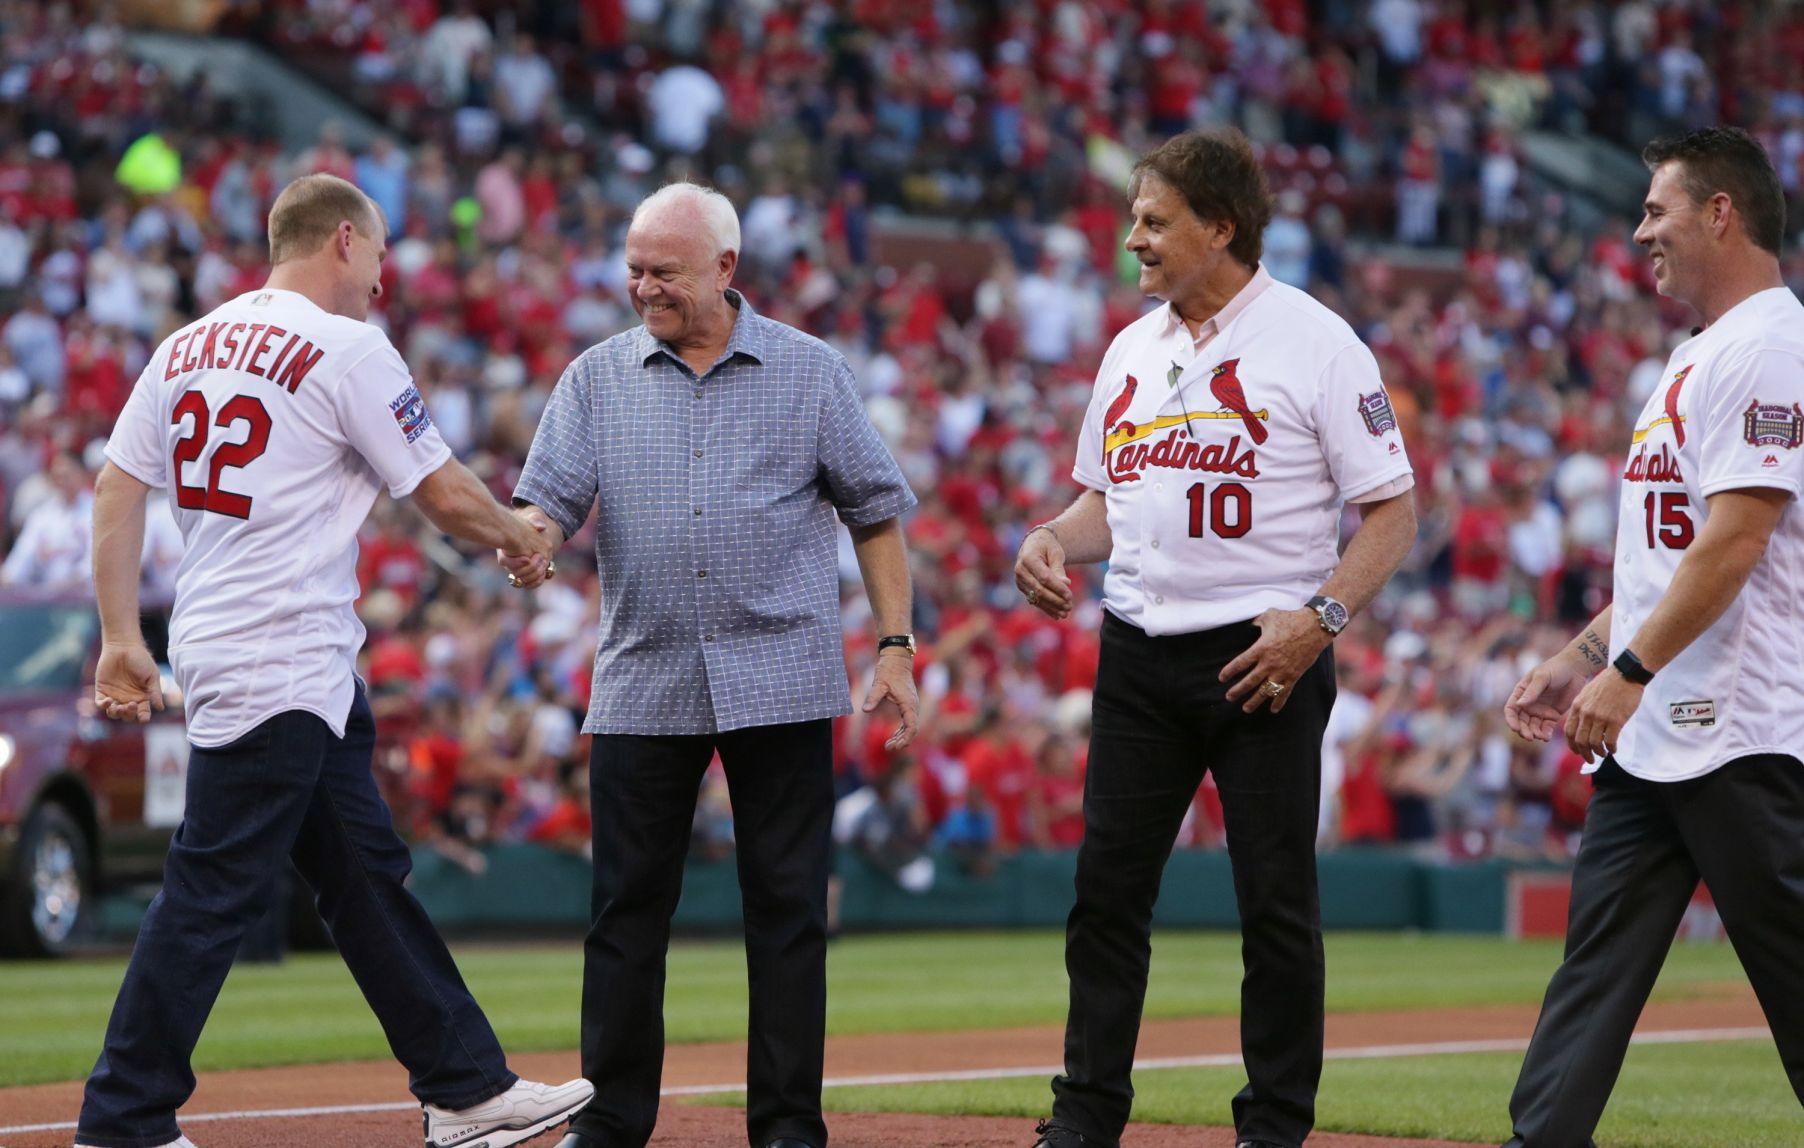 At Busch reunion, players recall barely making playoffs, then winning World Series